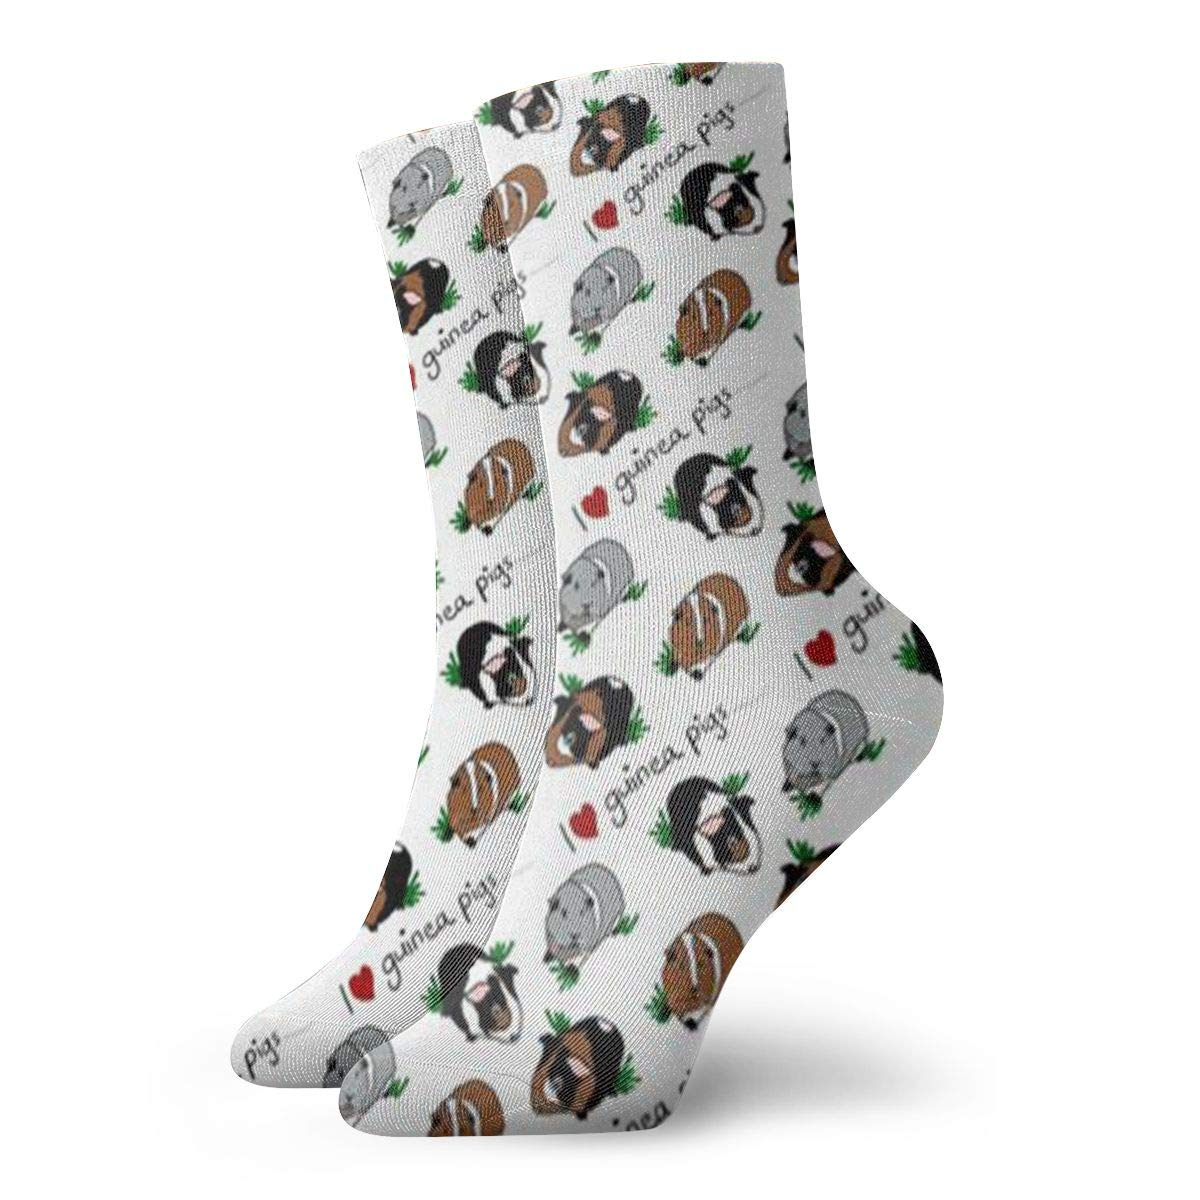 Guinea Pigs Unisex Funny Casual Crew Socks Athletic Socks For Boys Girls Kids Teenagers